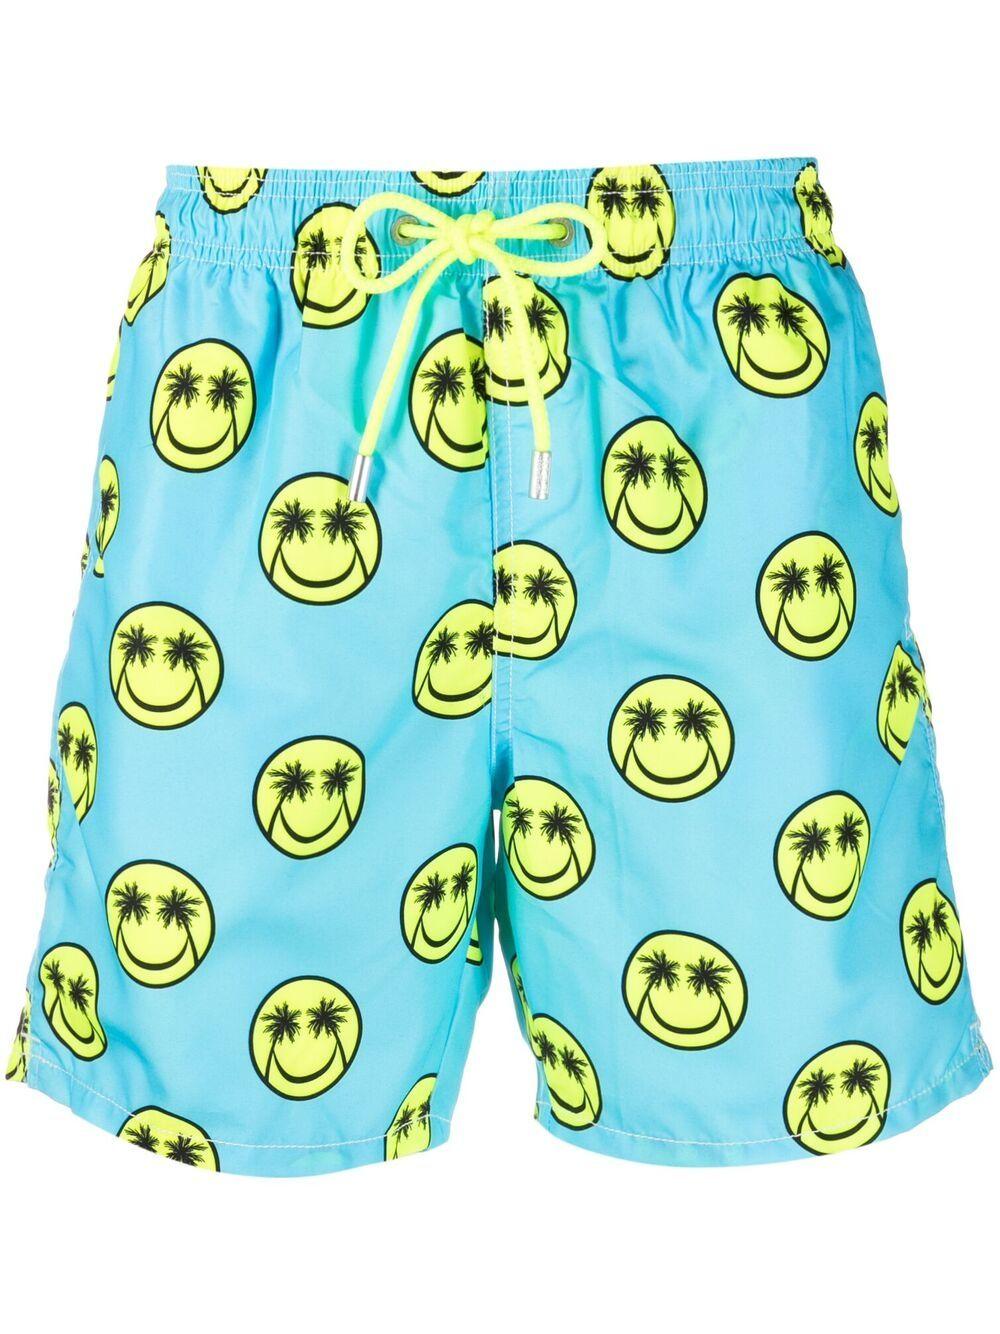 Blue recycled polyester Gustavia Palm Smile print swim shorts  MC2 |  | GUSTAVIA-PALM SMILE56